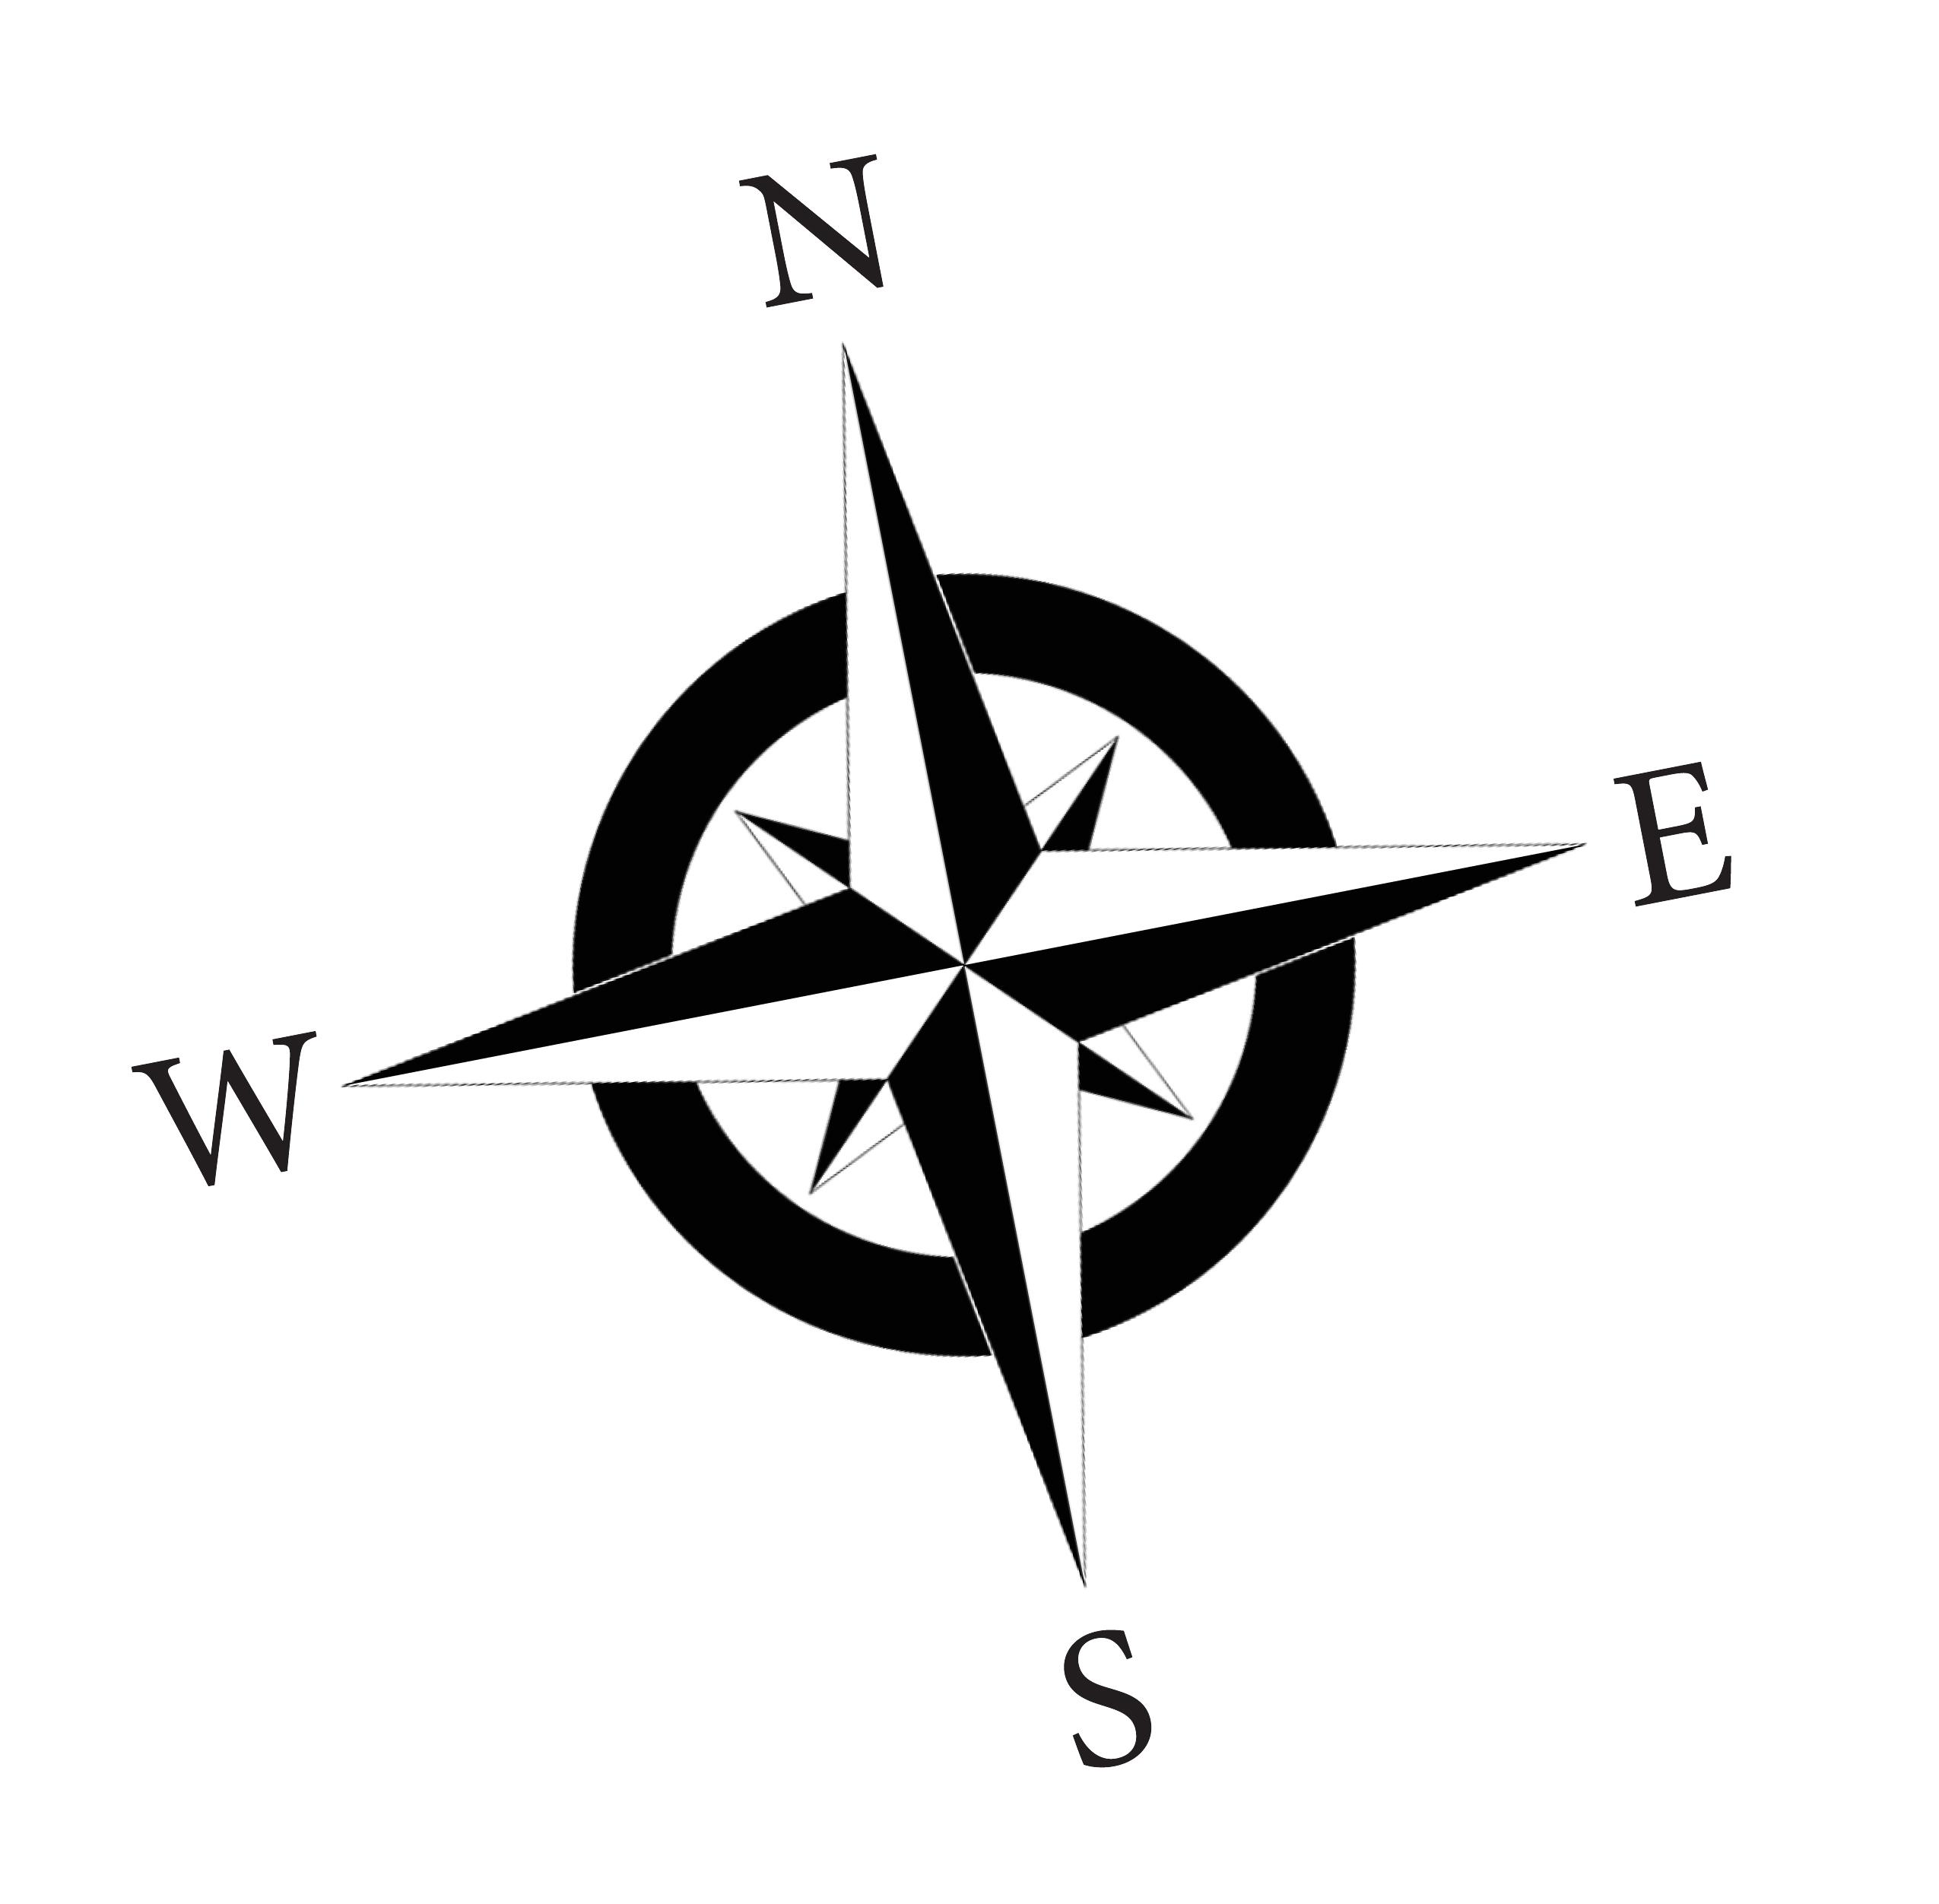 2550x2504 Compass Rose Nsew Bw.indd Siena Catholic Academy